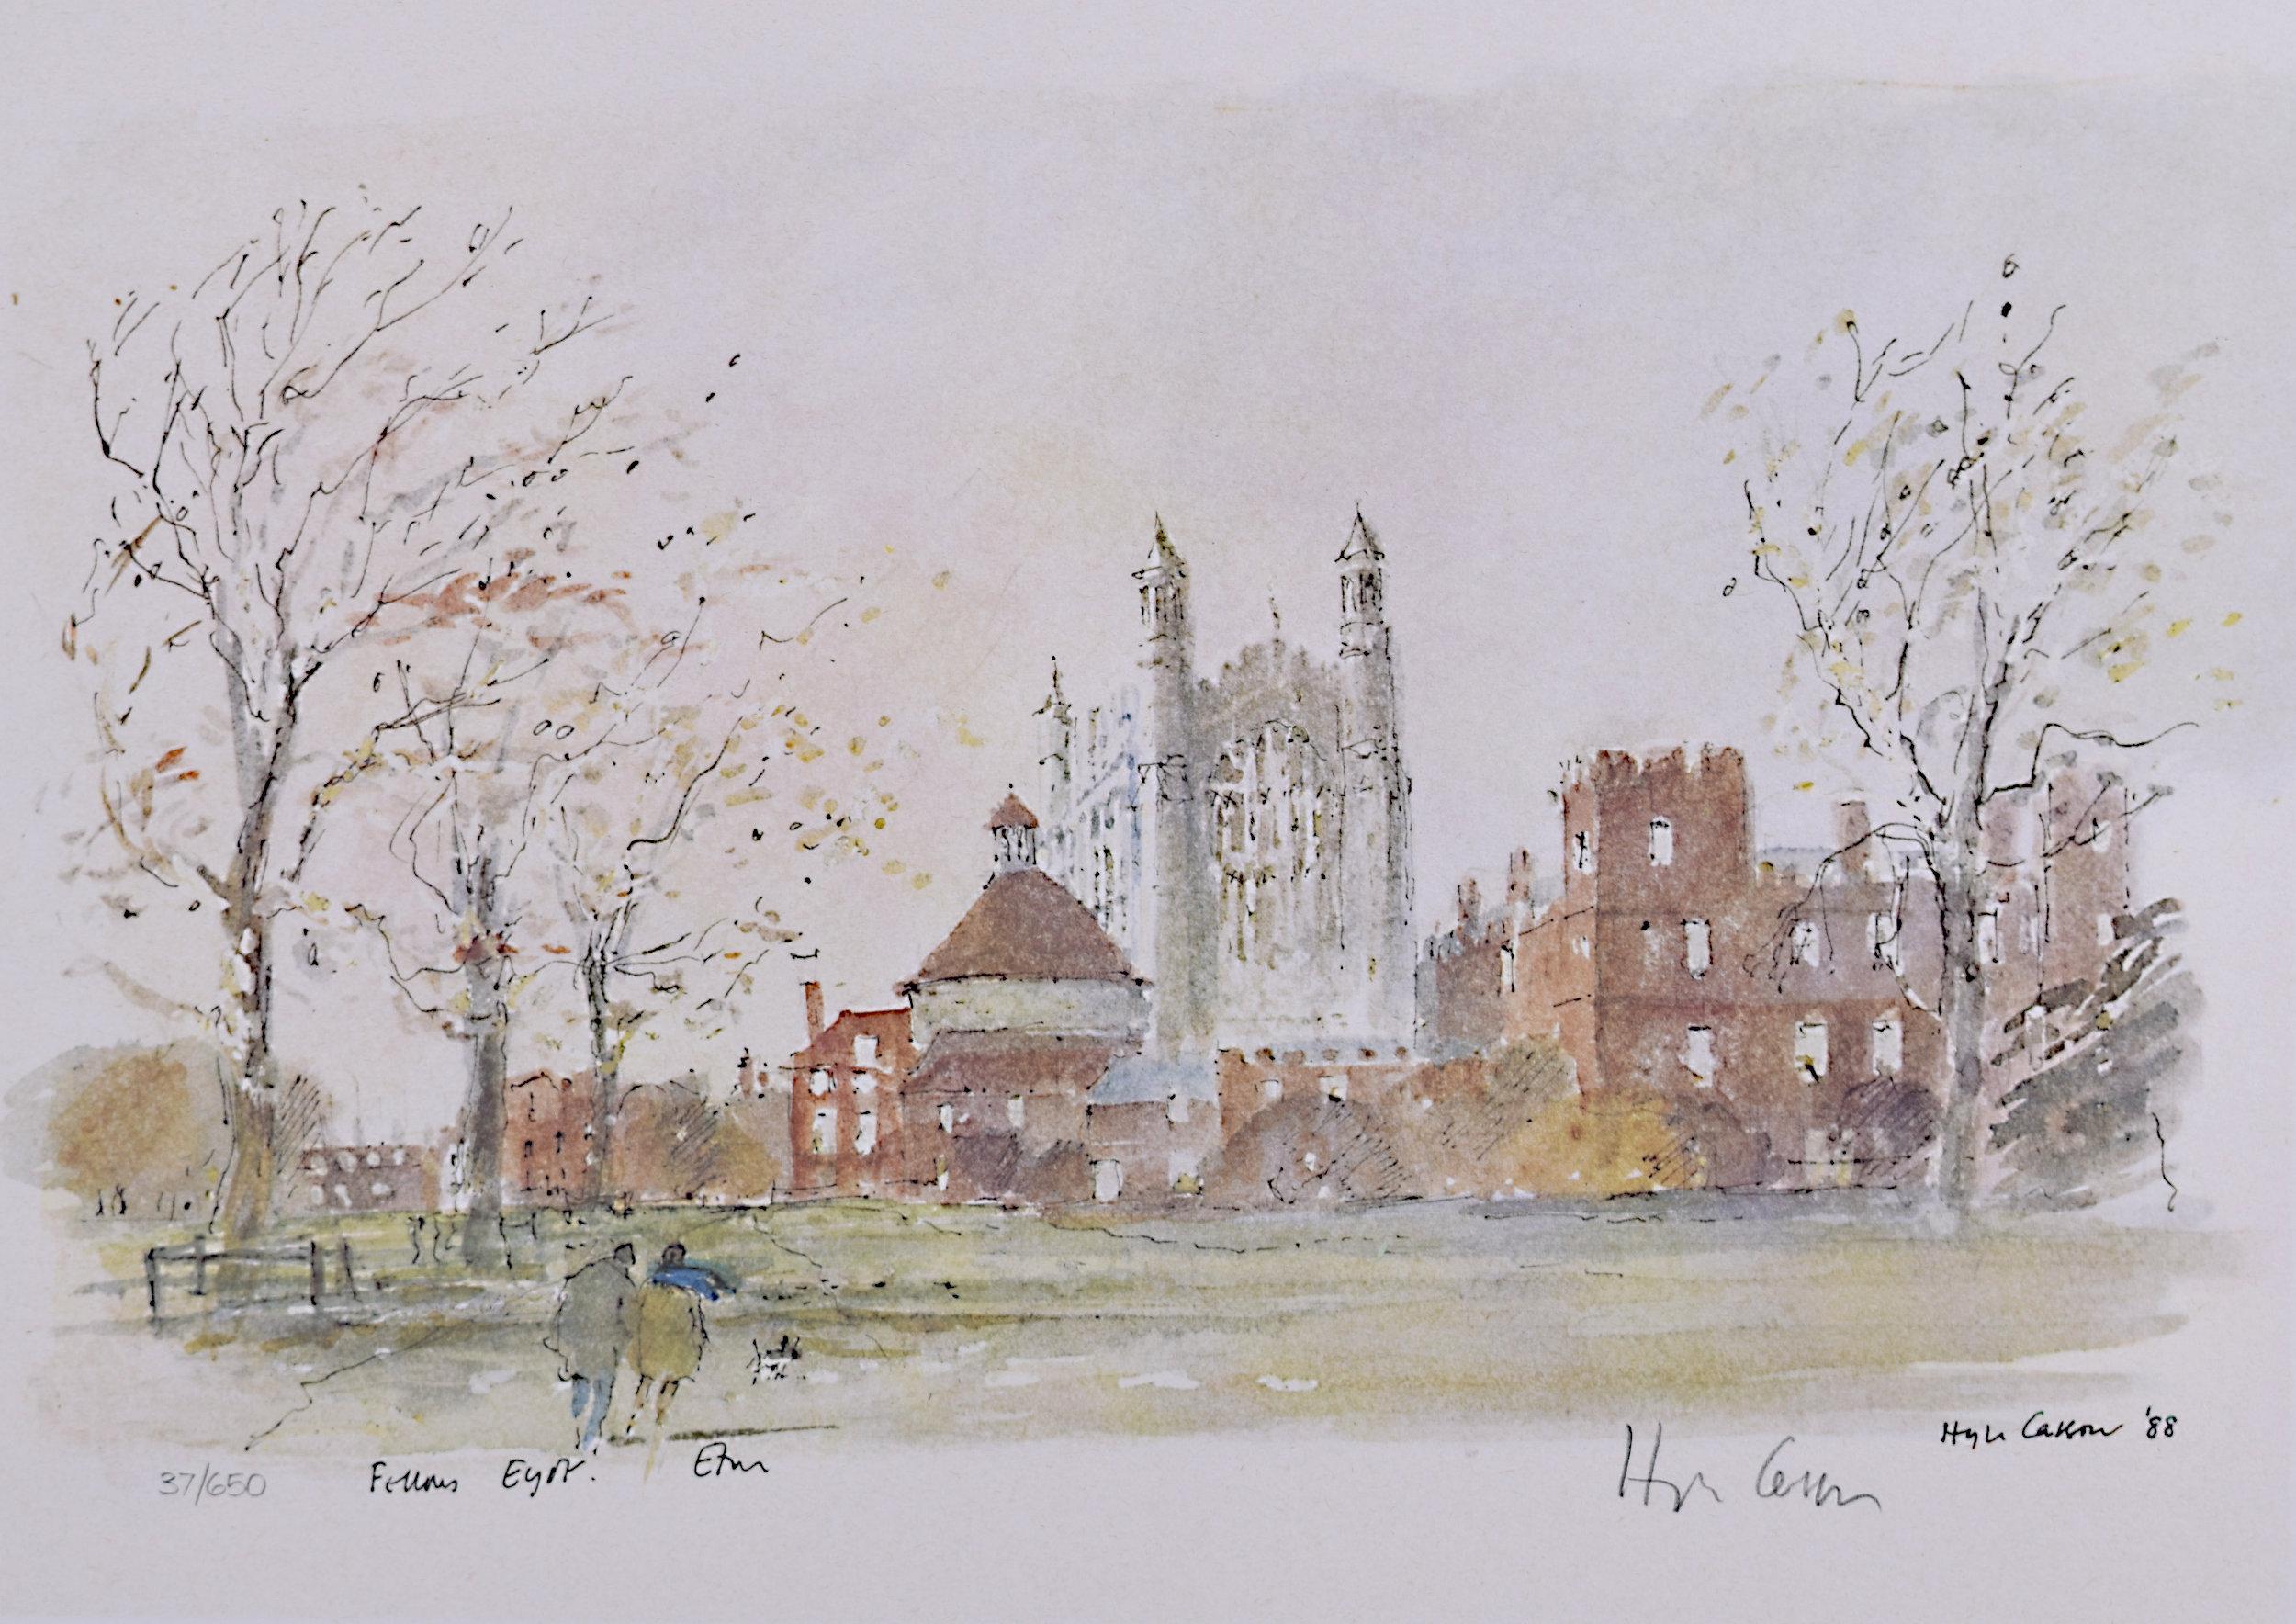 Hugh Casson Eton College 'Fellows Eyot' signed limited edition print